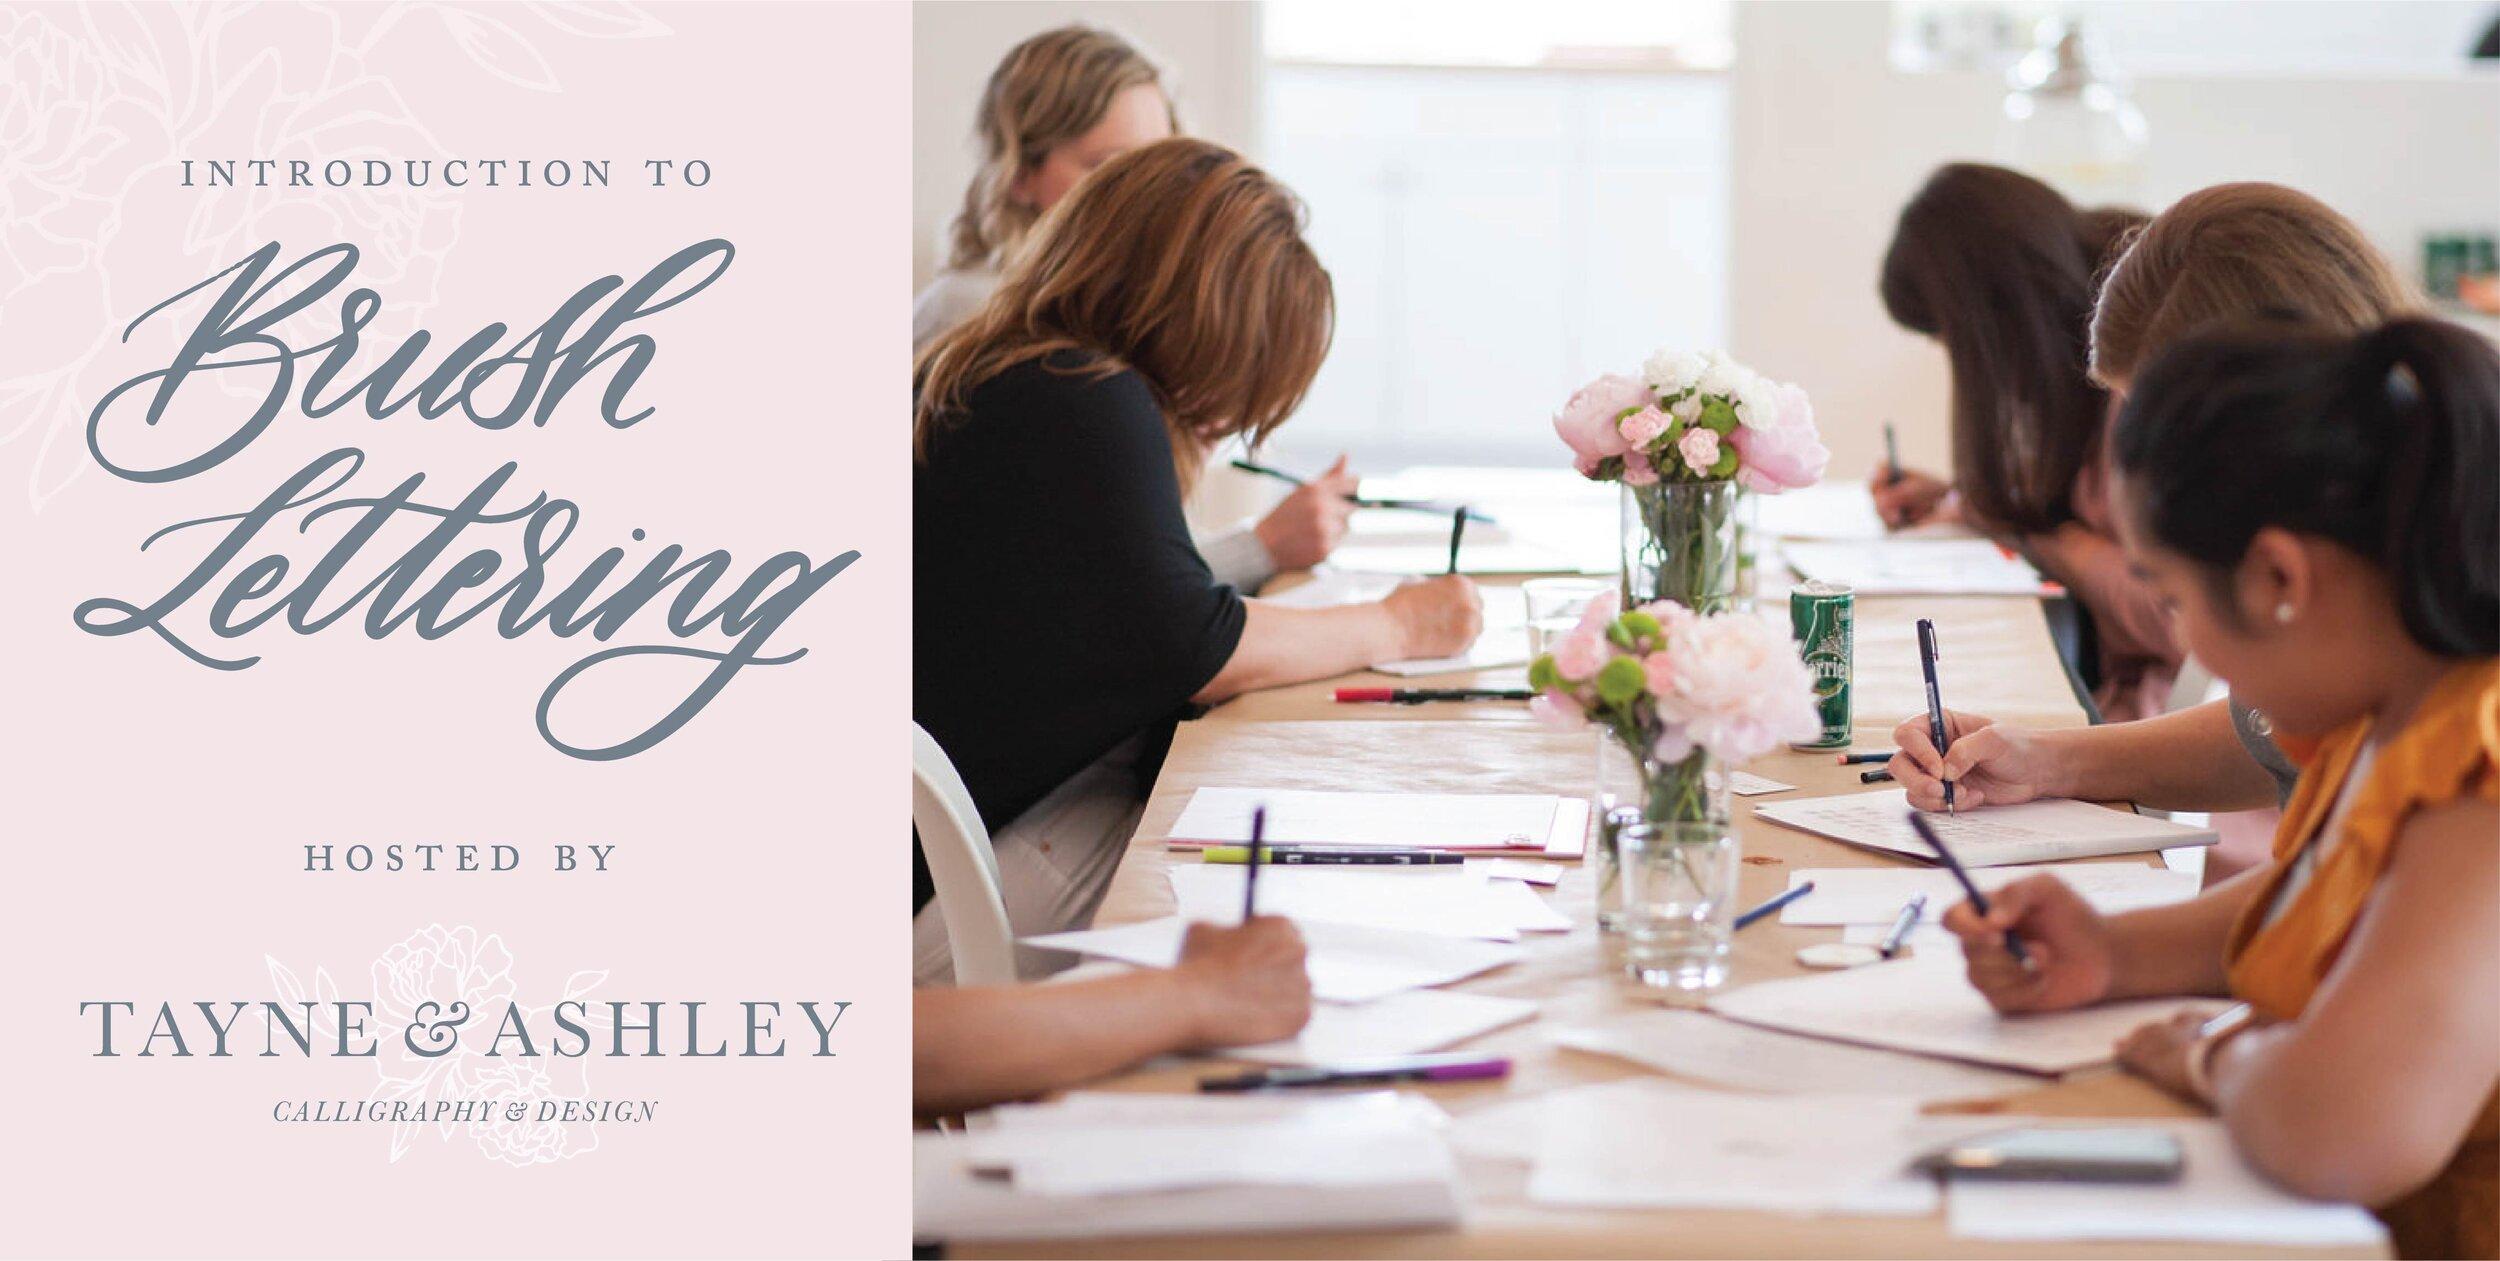 Tayne-And-Ashley-Intro-Brush-Lettering-eventbrite-fall2019-01.jpg